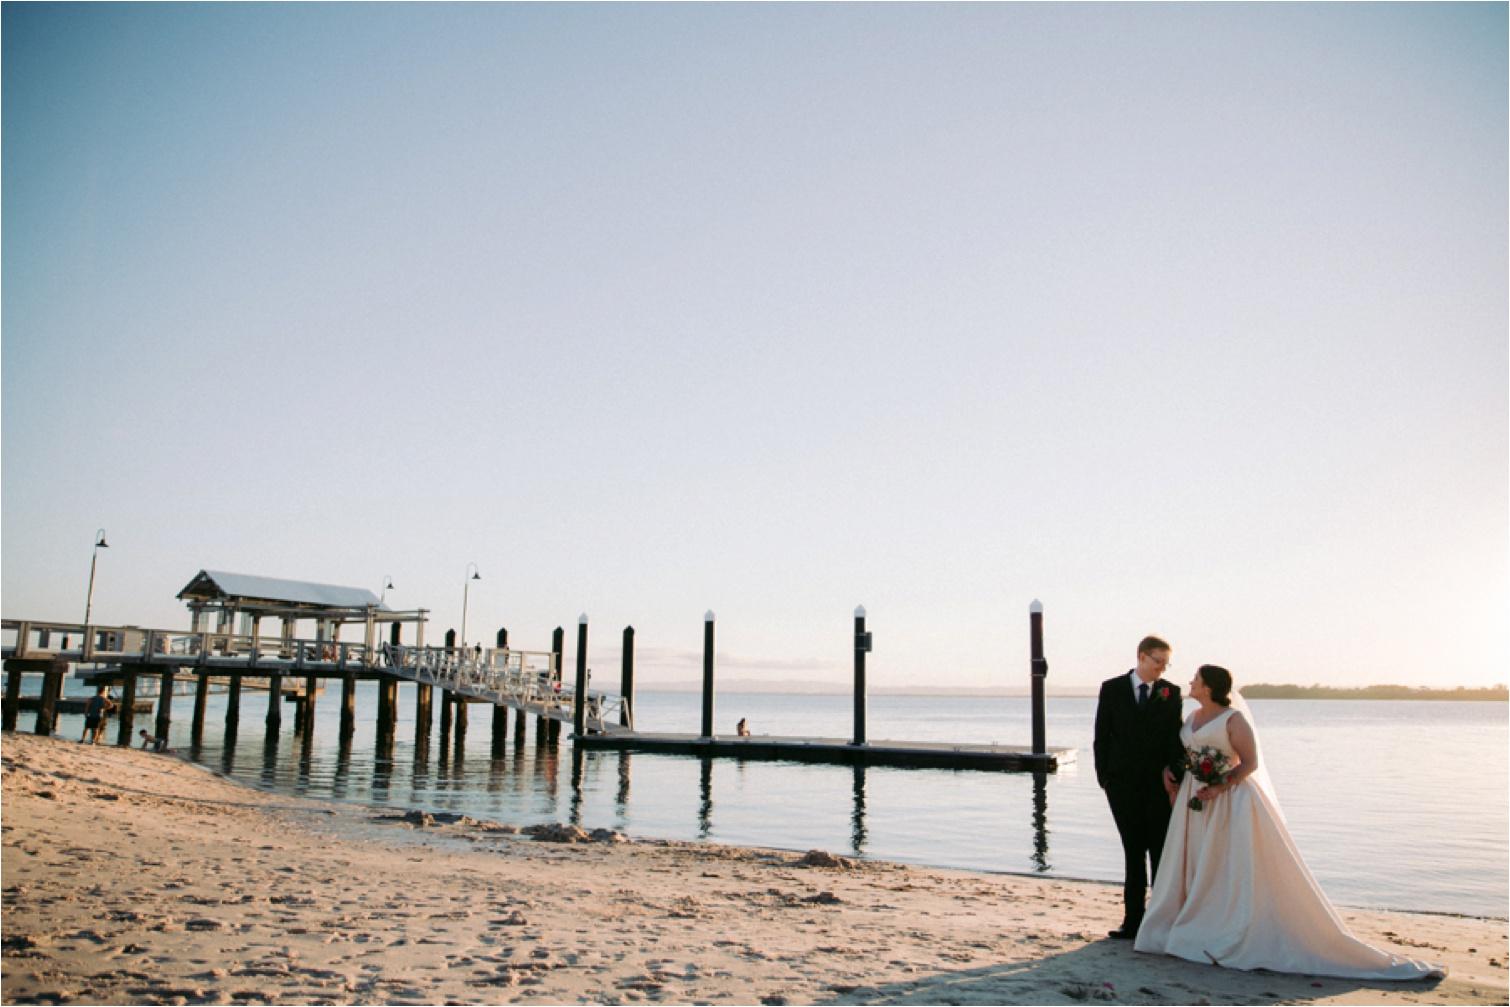 Bribie_Island_wharf_Wedding_Photography